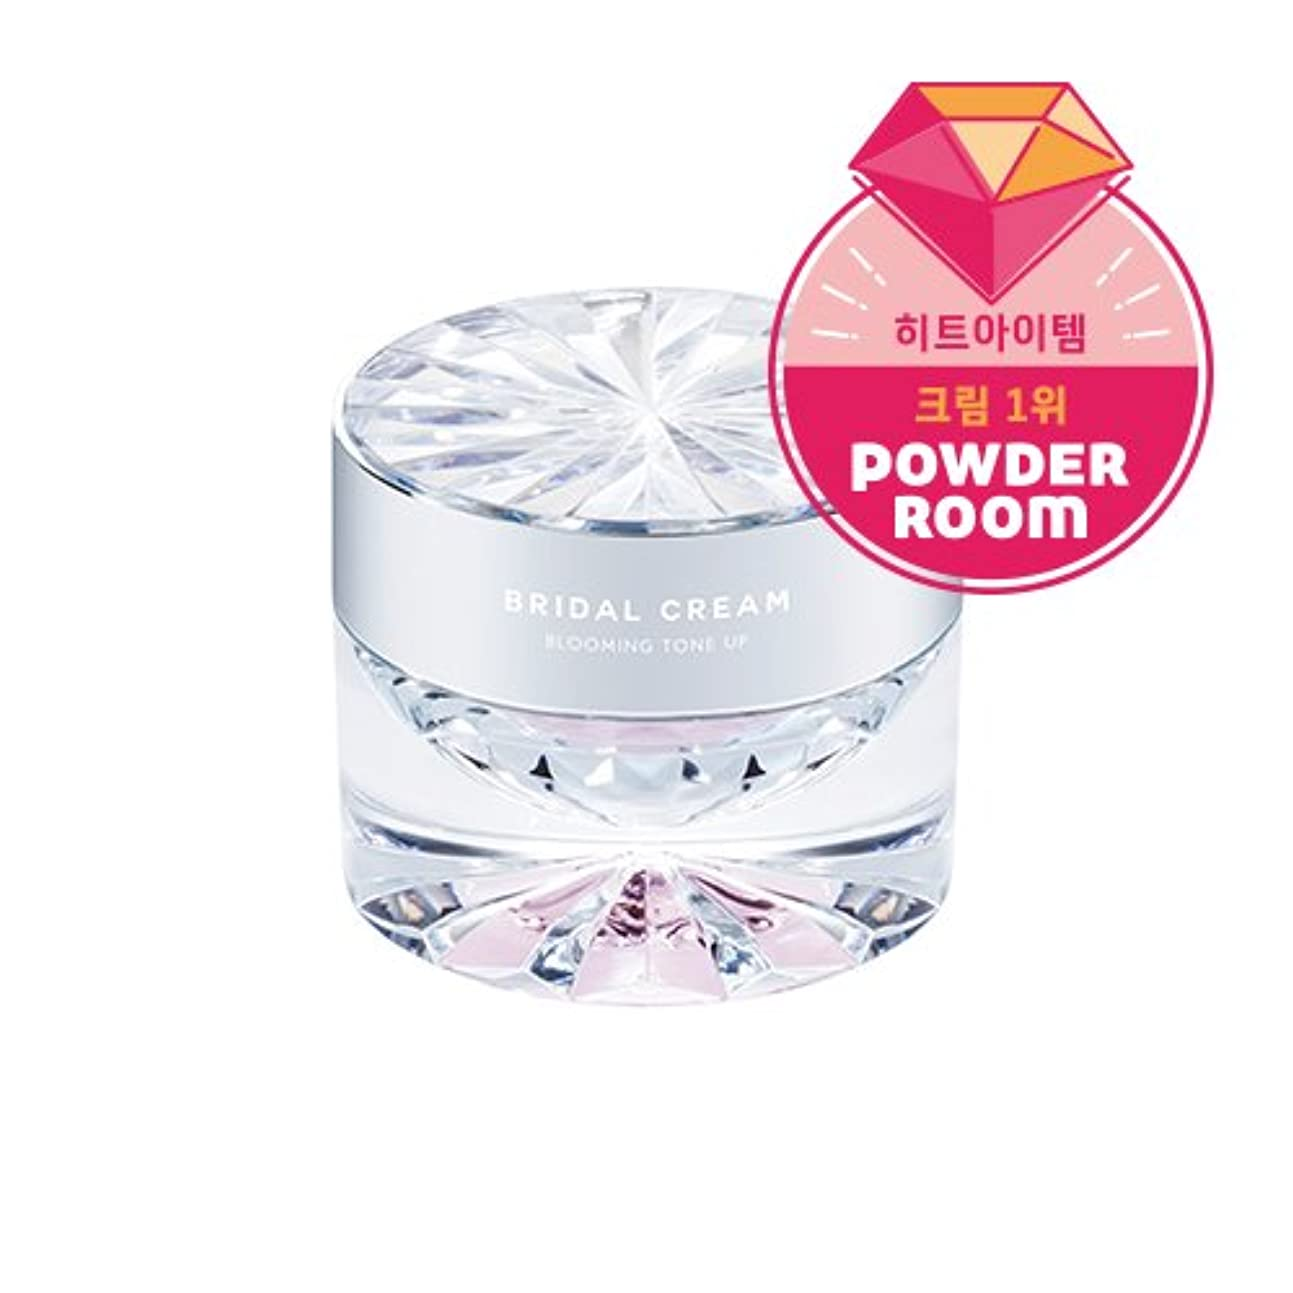 MISSHA Time Revolution Bridal Cream 50ml/ミシャ タイム レボリューション ブライダル クリーム 50ml (#Blooming Tone Up) [並行輸入品]